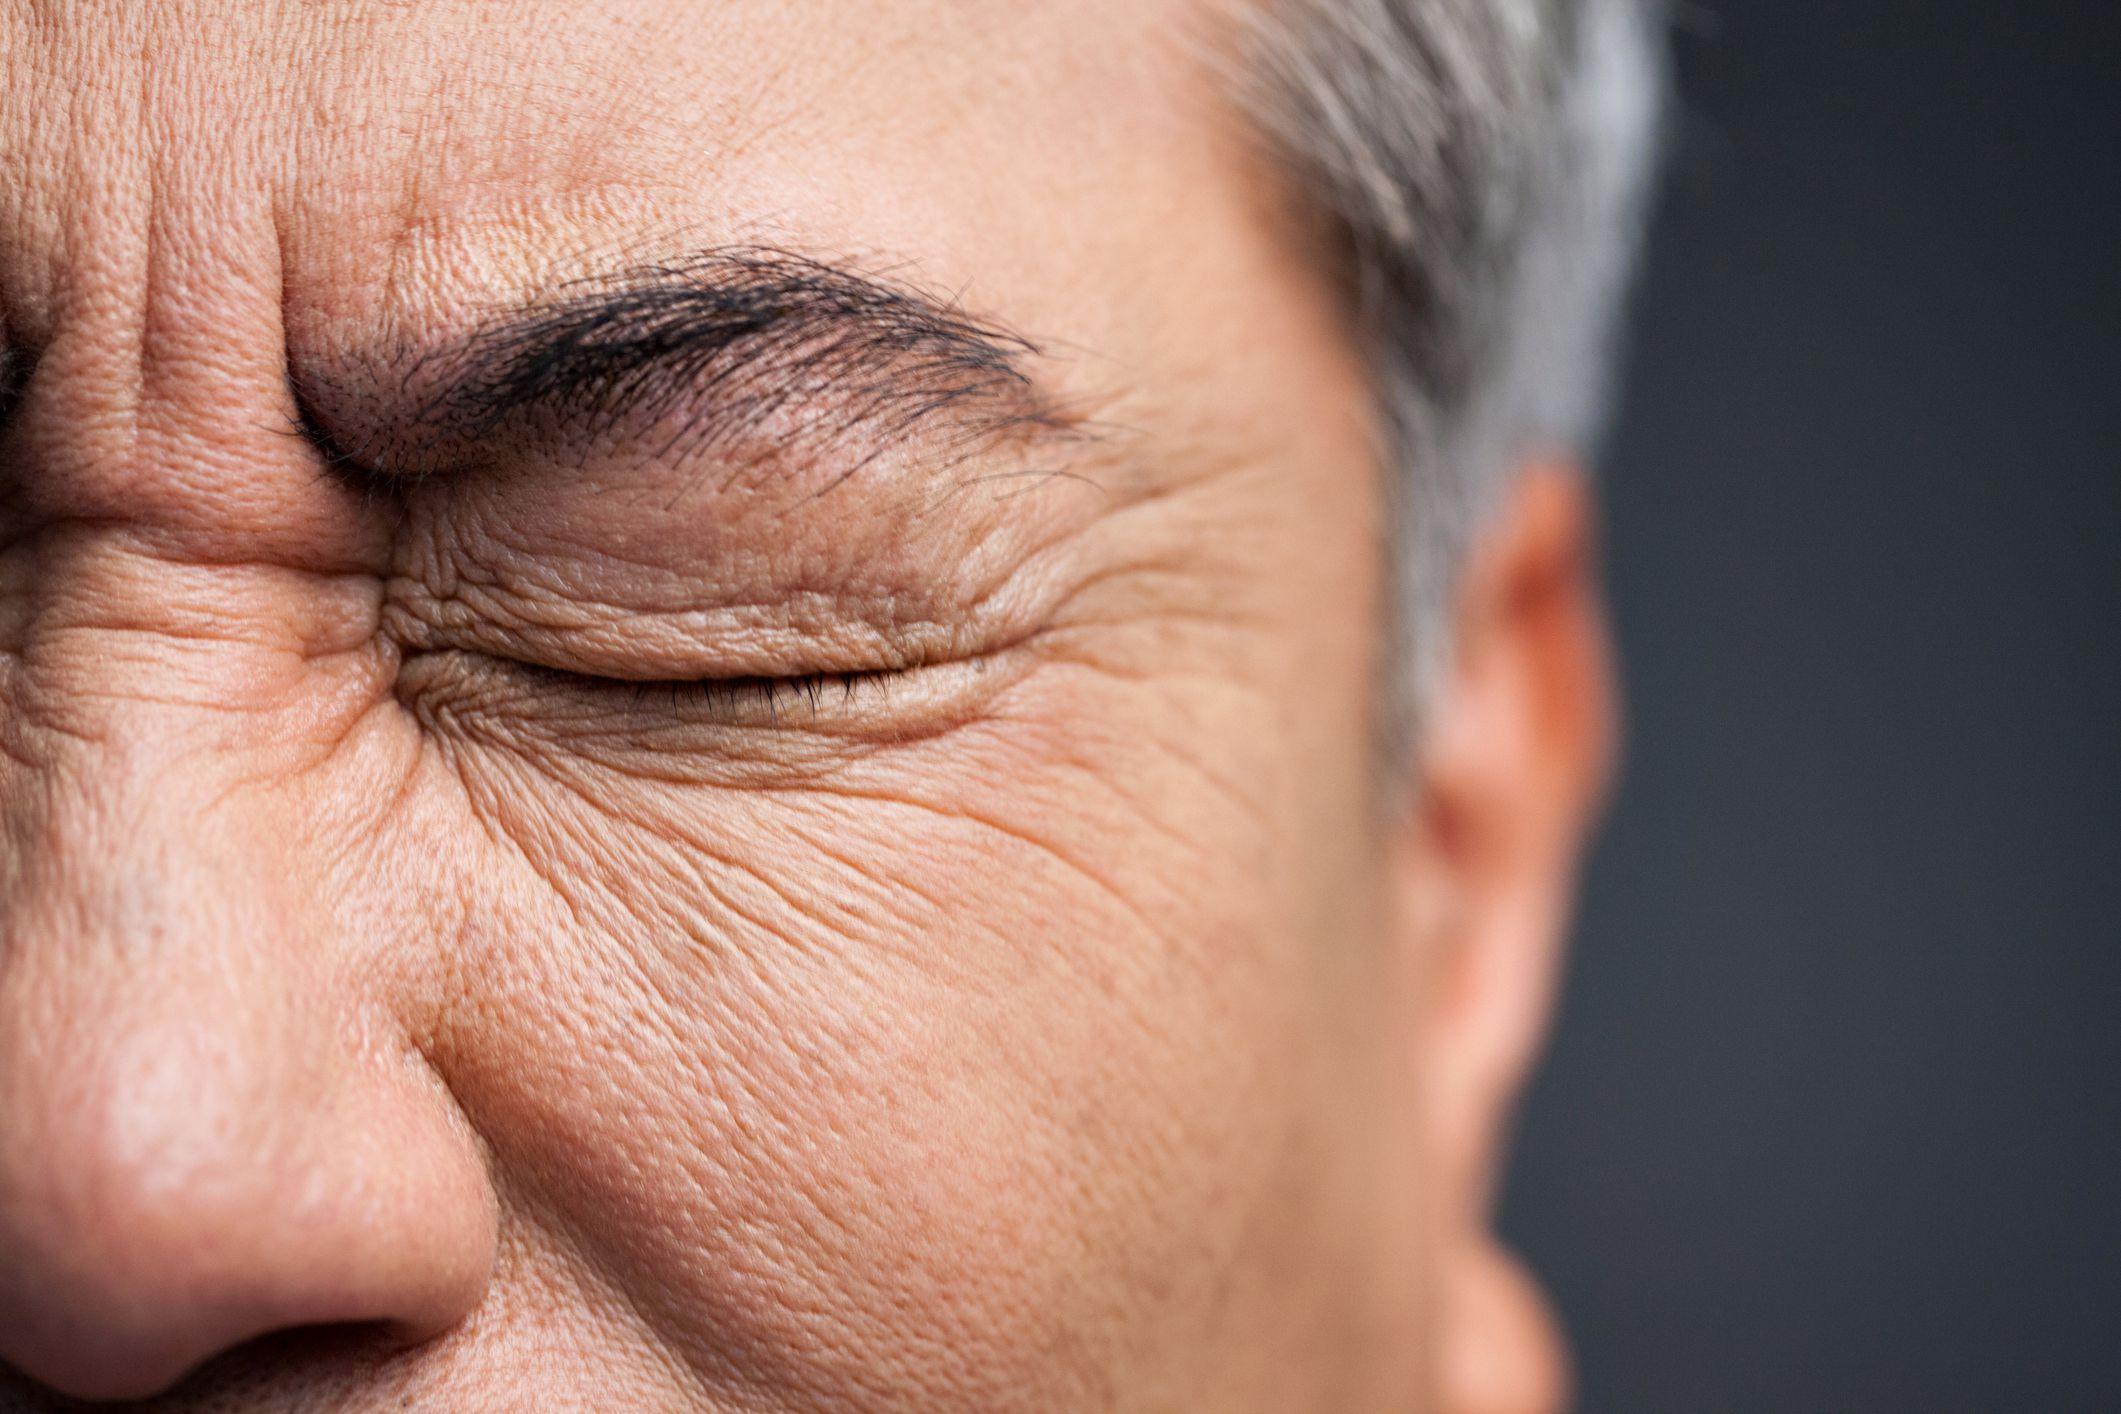 3 Ways to Treat Chronic and Stubborn Blepharitis